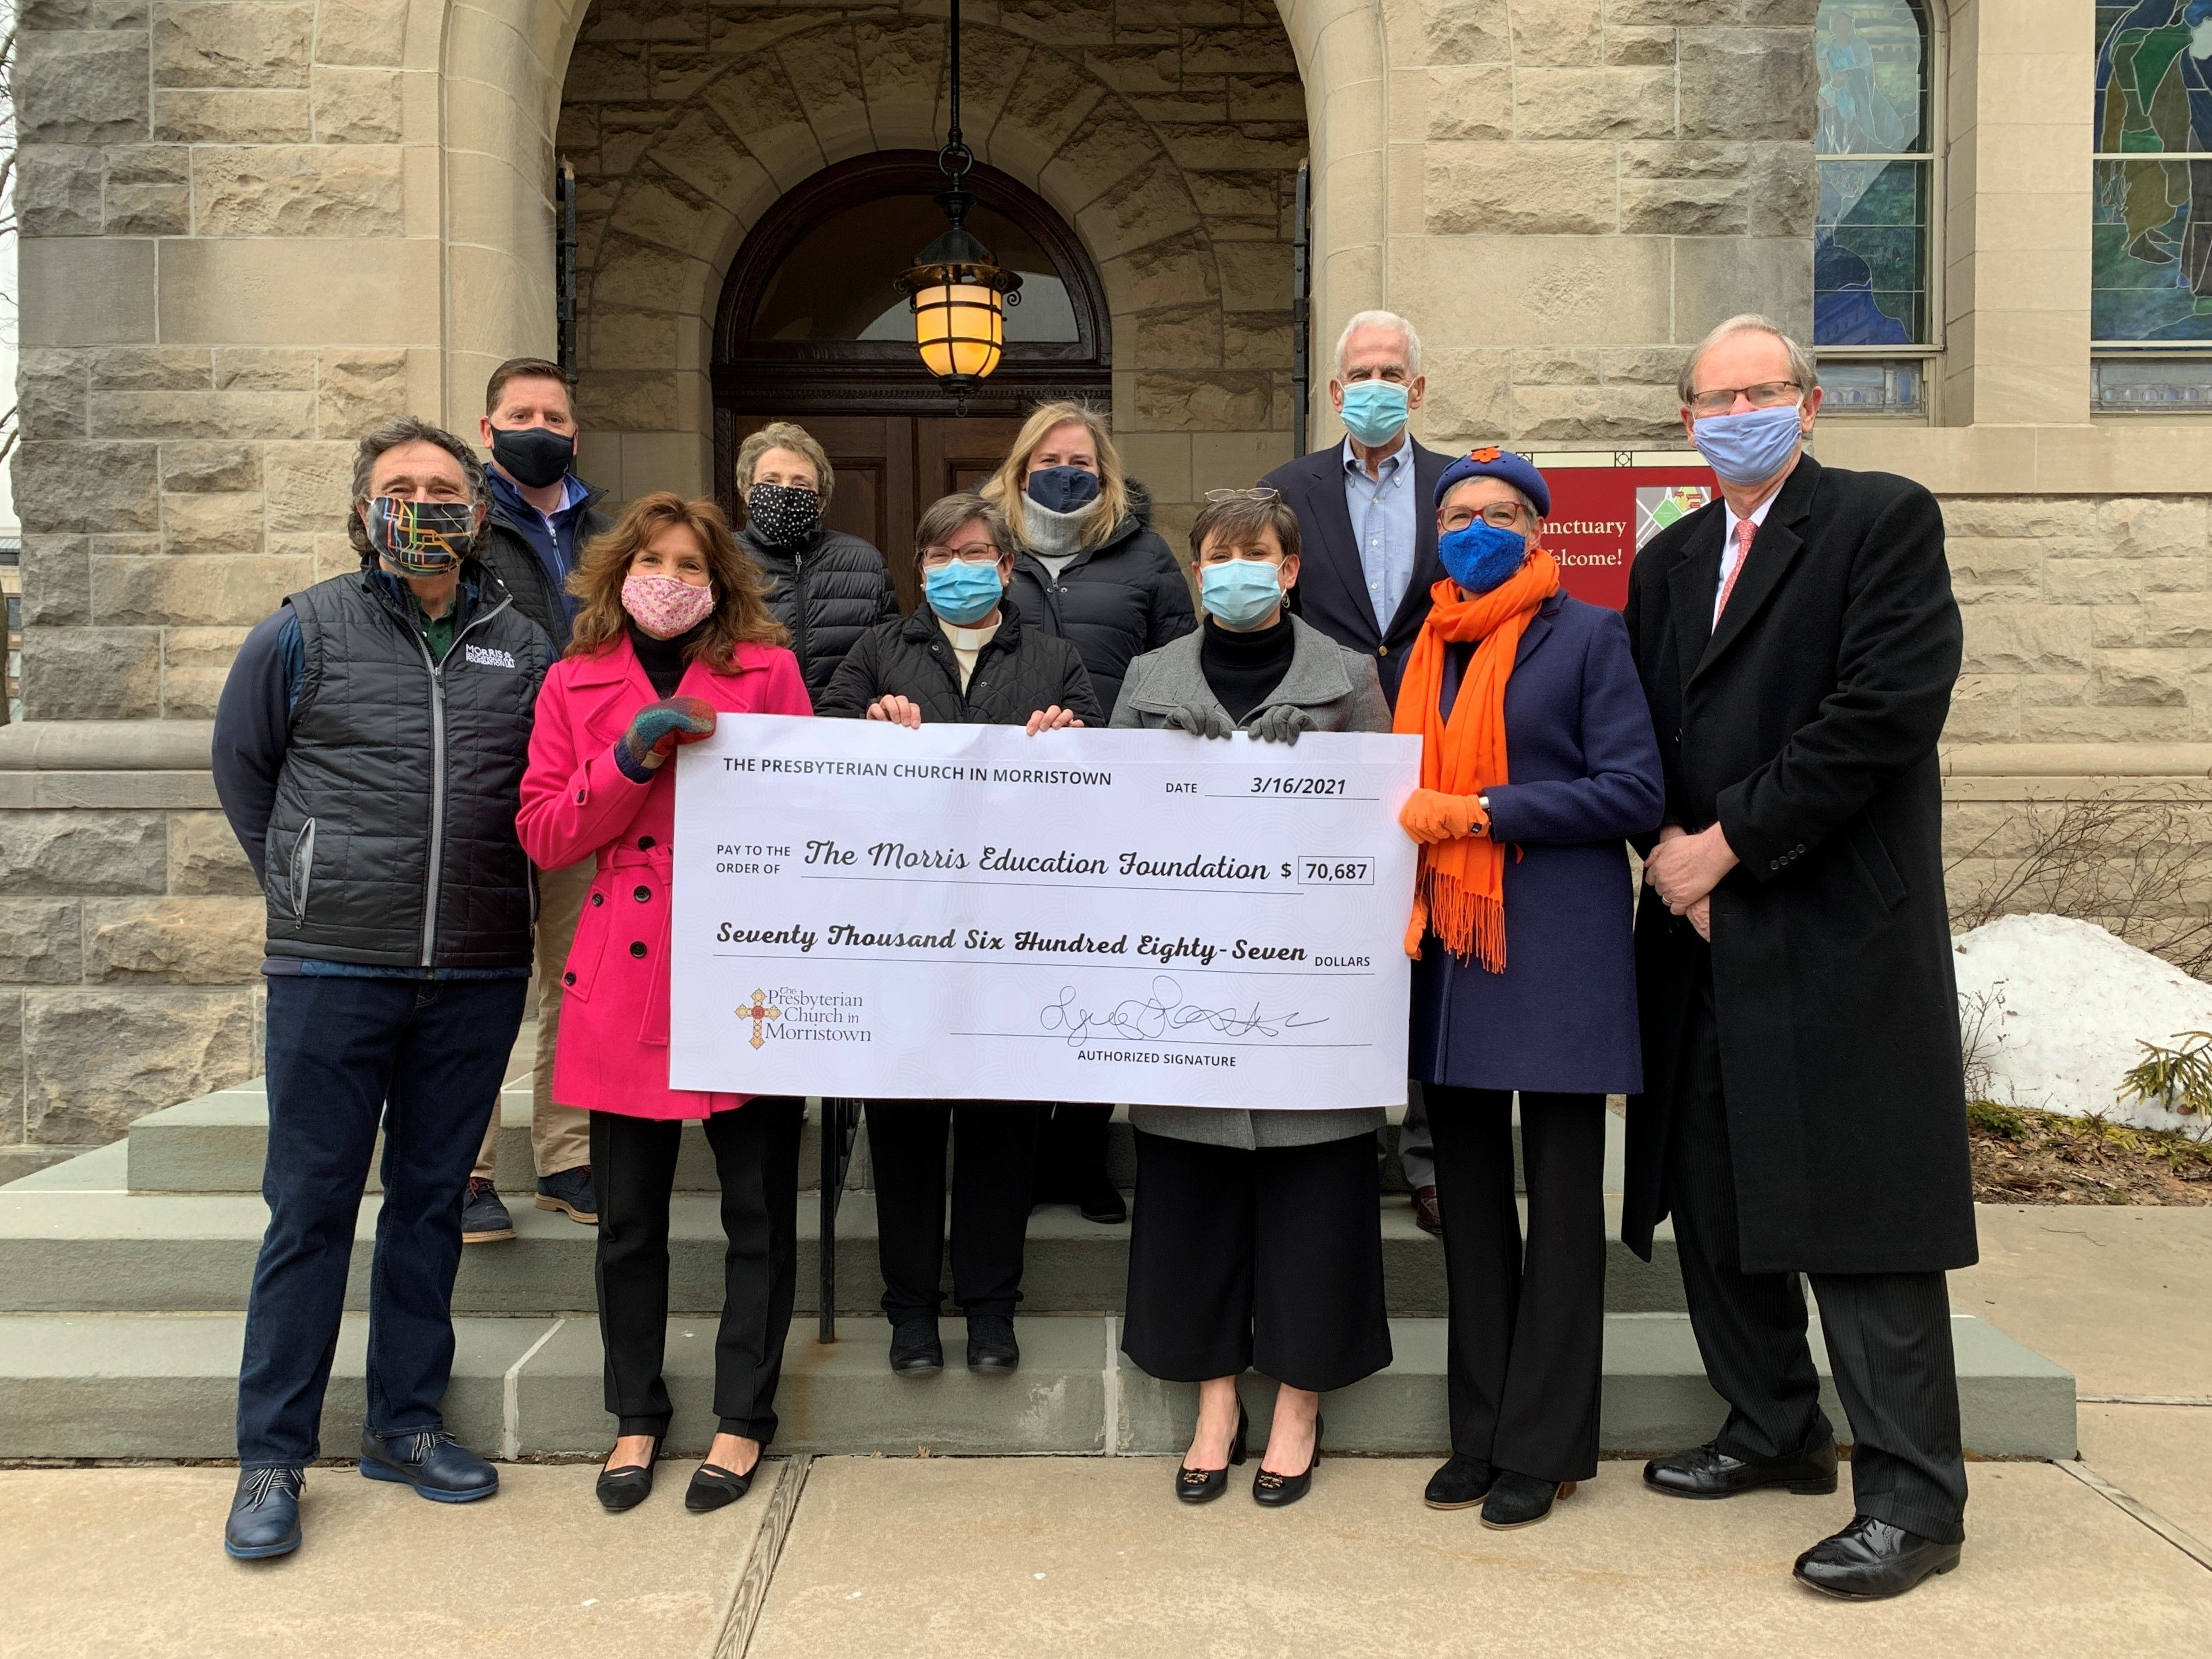 Presbyterian Church in Morristown Donates $70K to Morris Educational Foundation